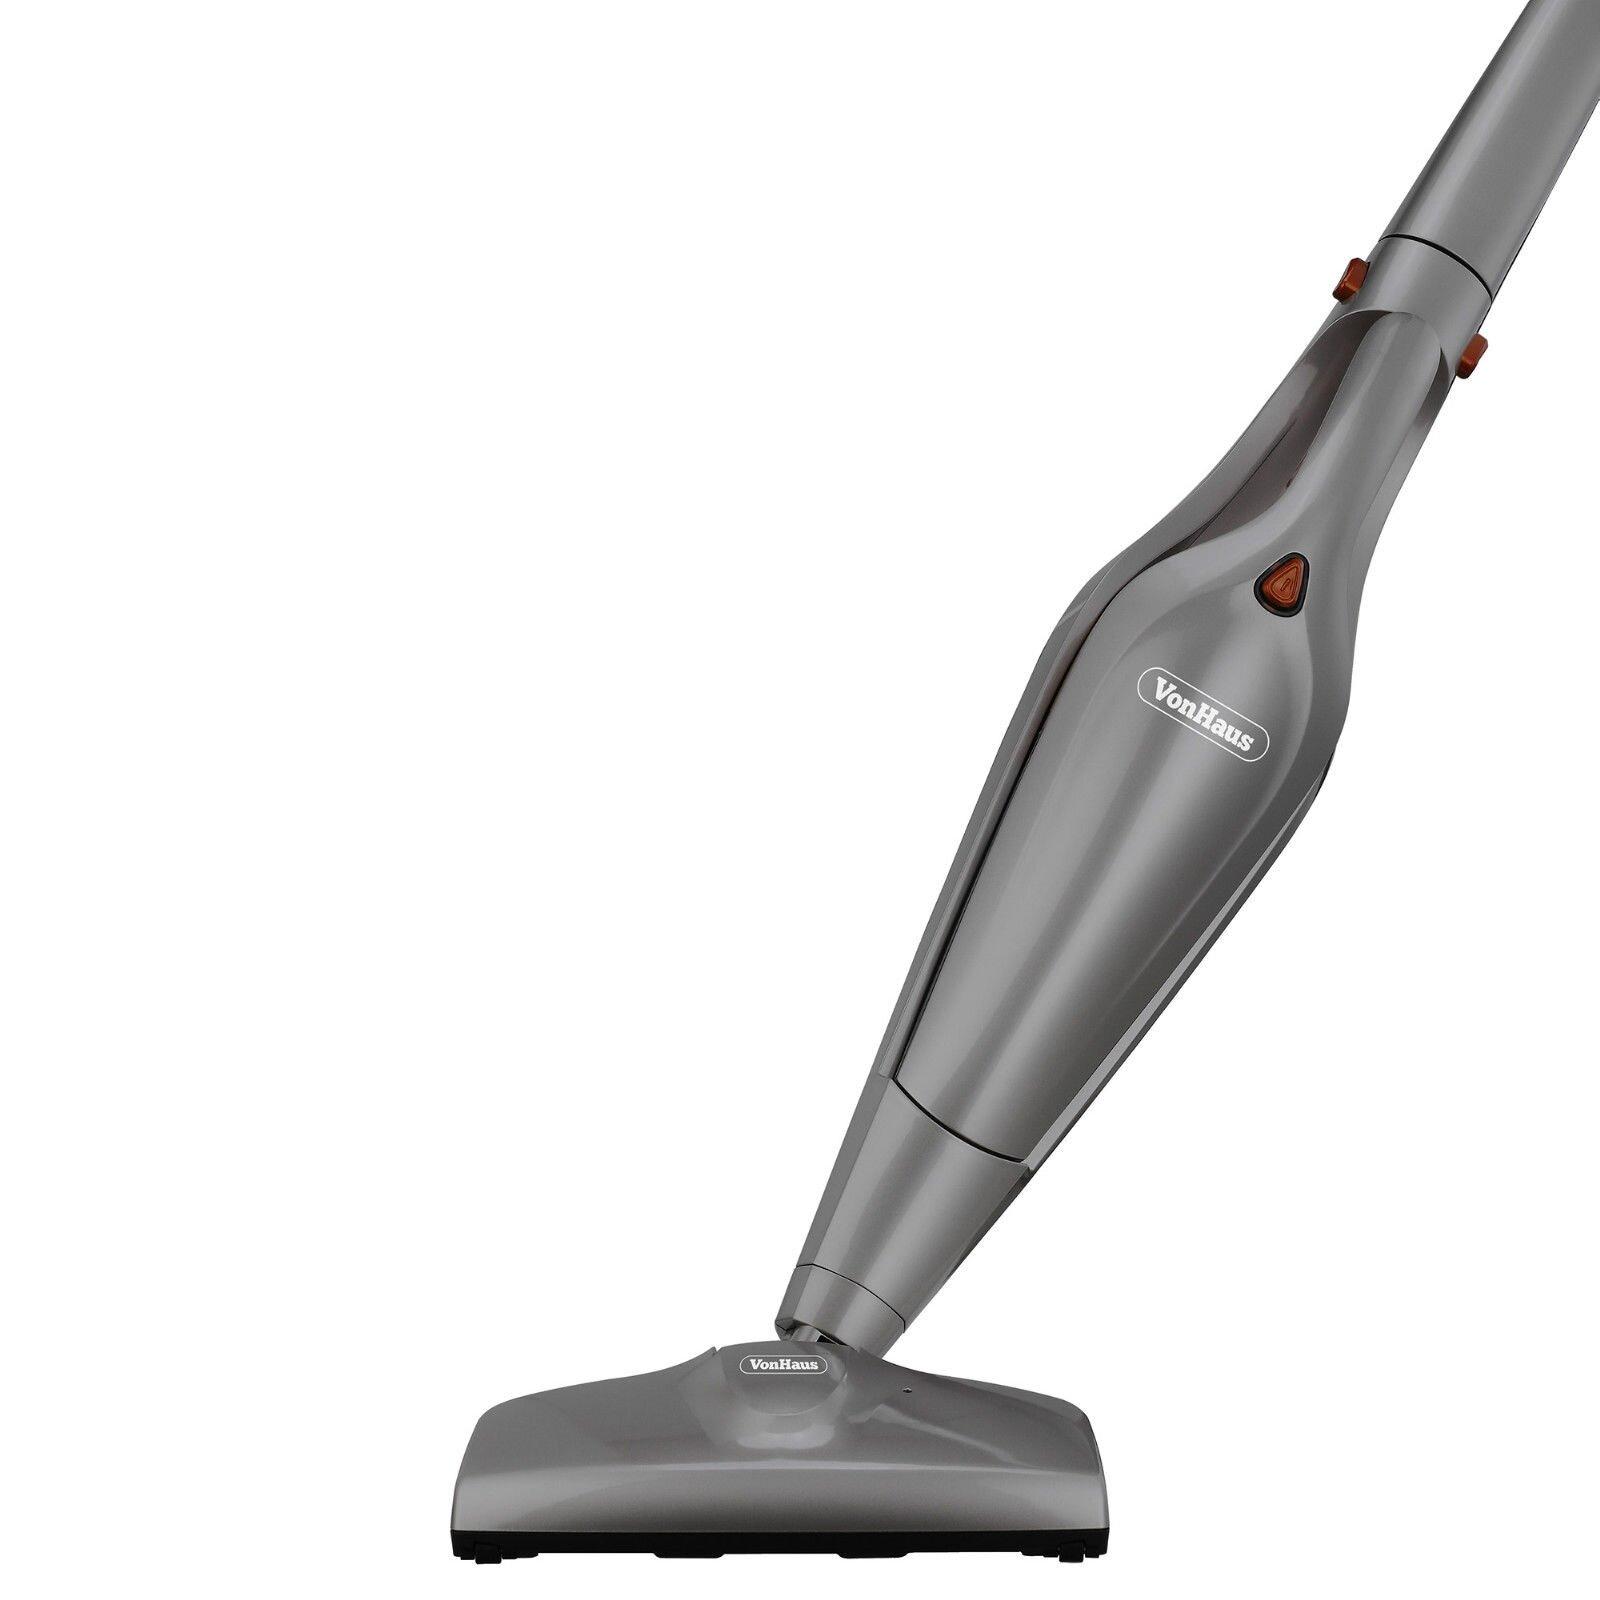 Cordless Vacuum For Hardwood Floors edge cleaning bristles 2 In 1 Cordless Vacuum Cleaner